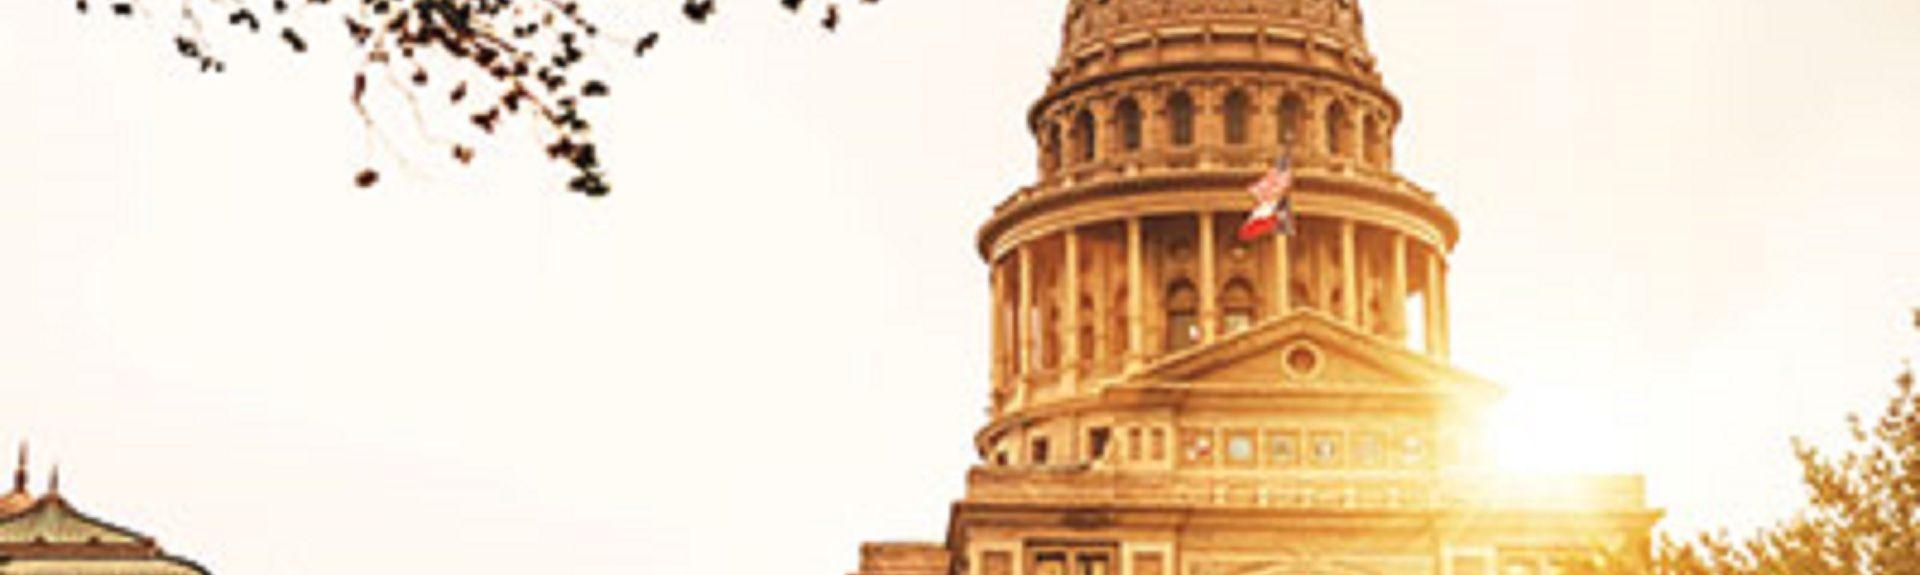 Zilker, Austin, Texas, United States of America